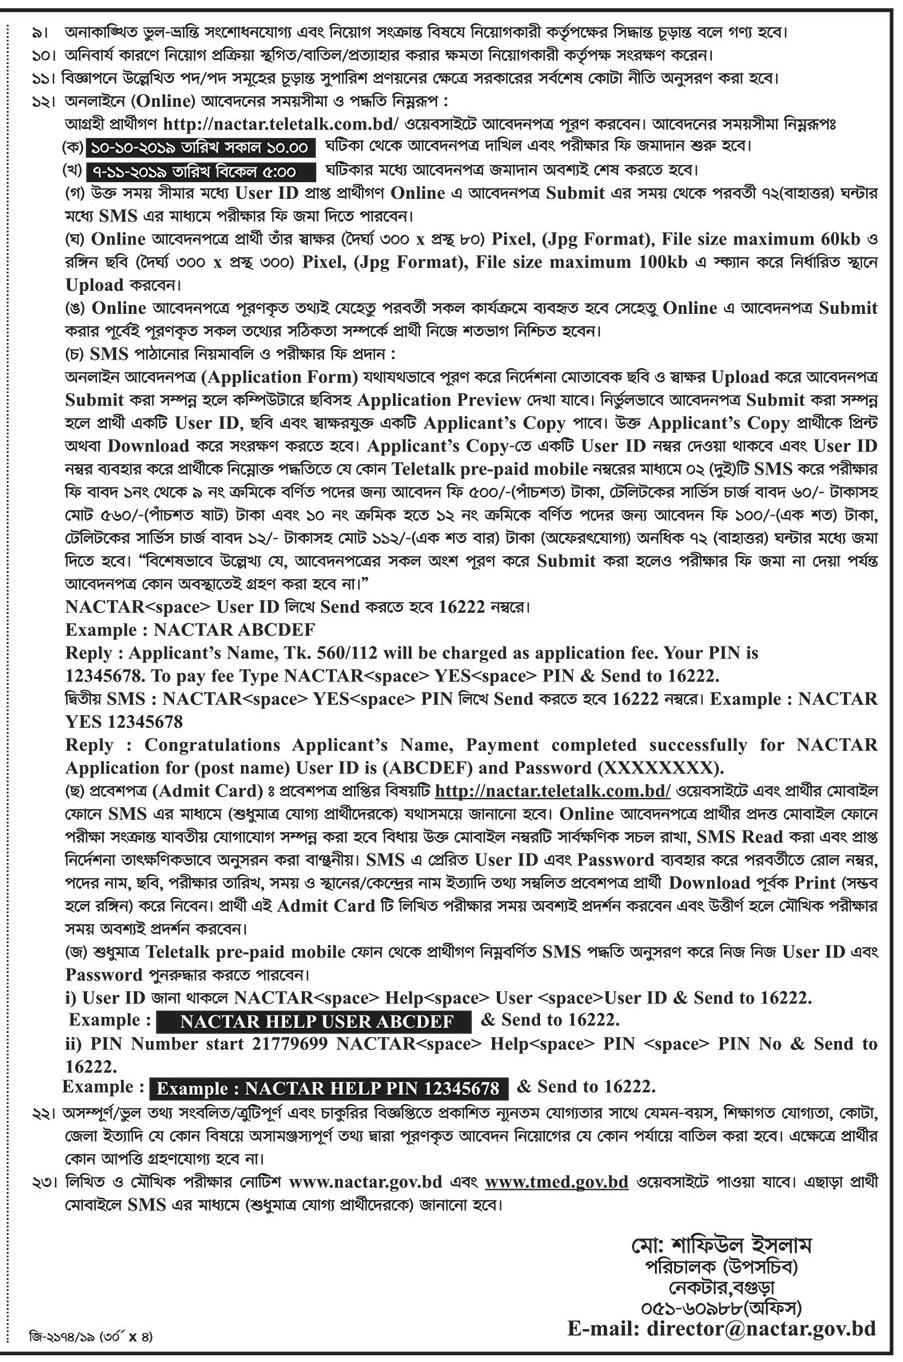 National Computer Training and Research Academy (NACTAR) Job Circular 2019